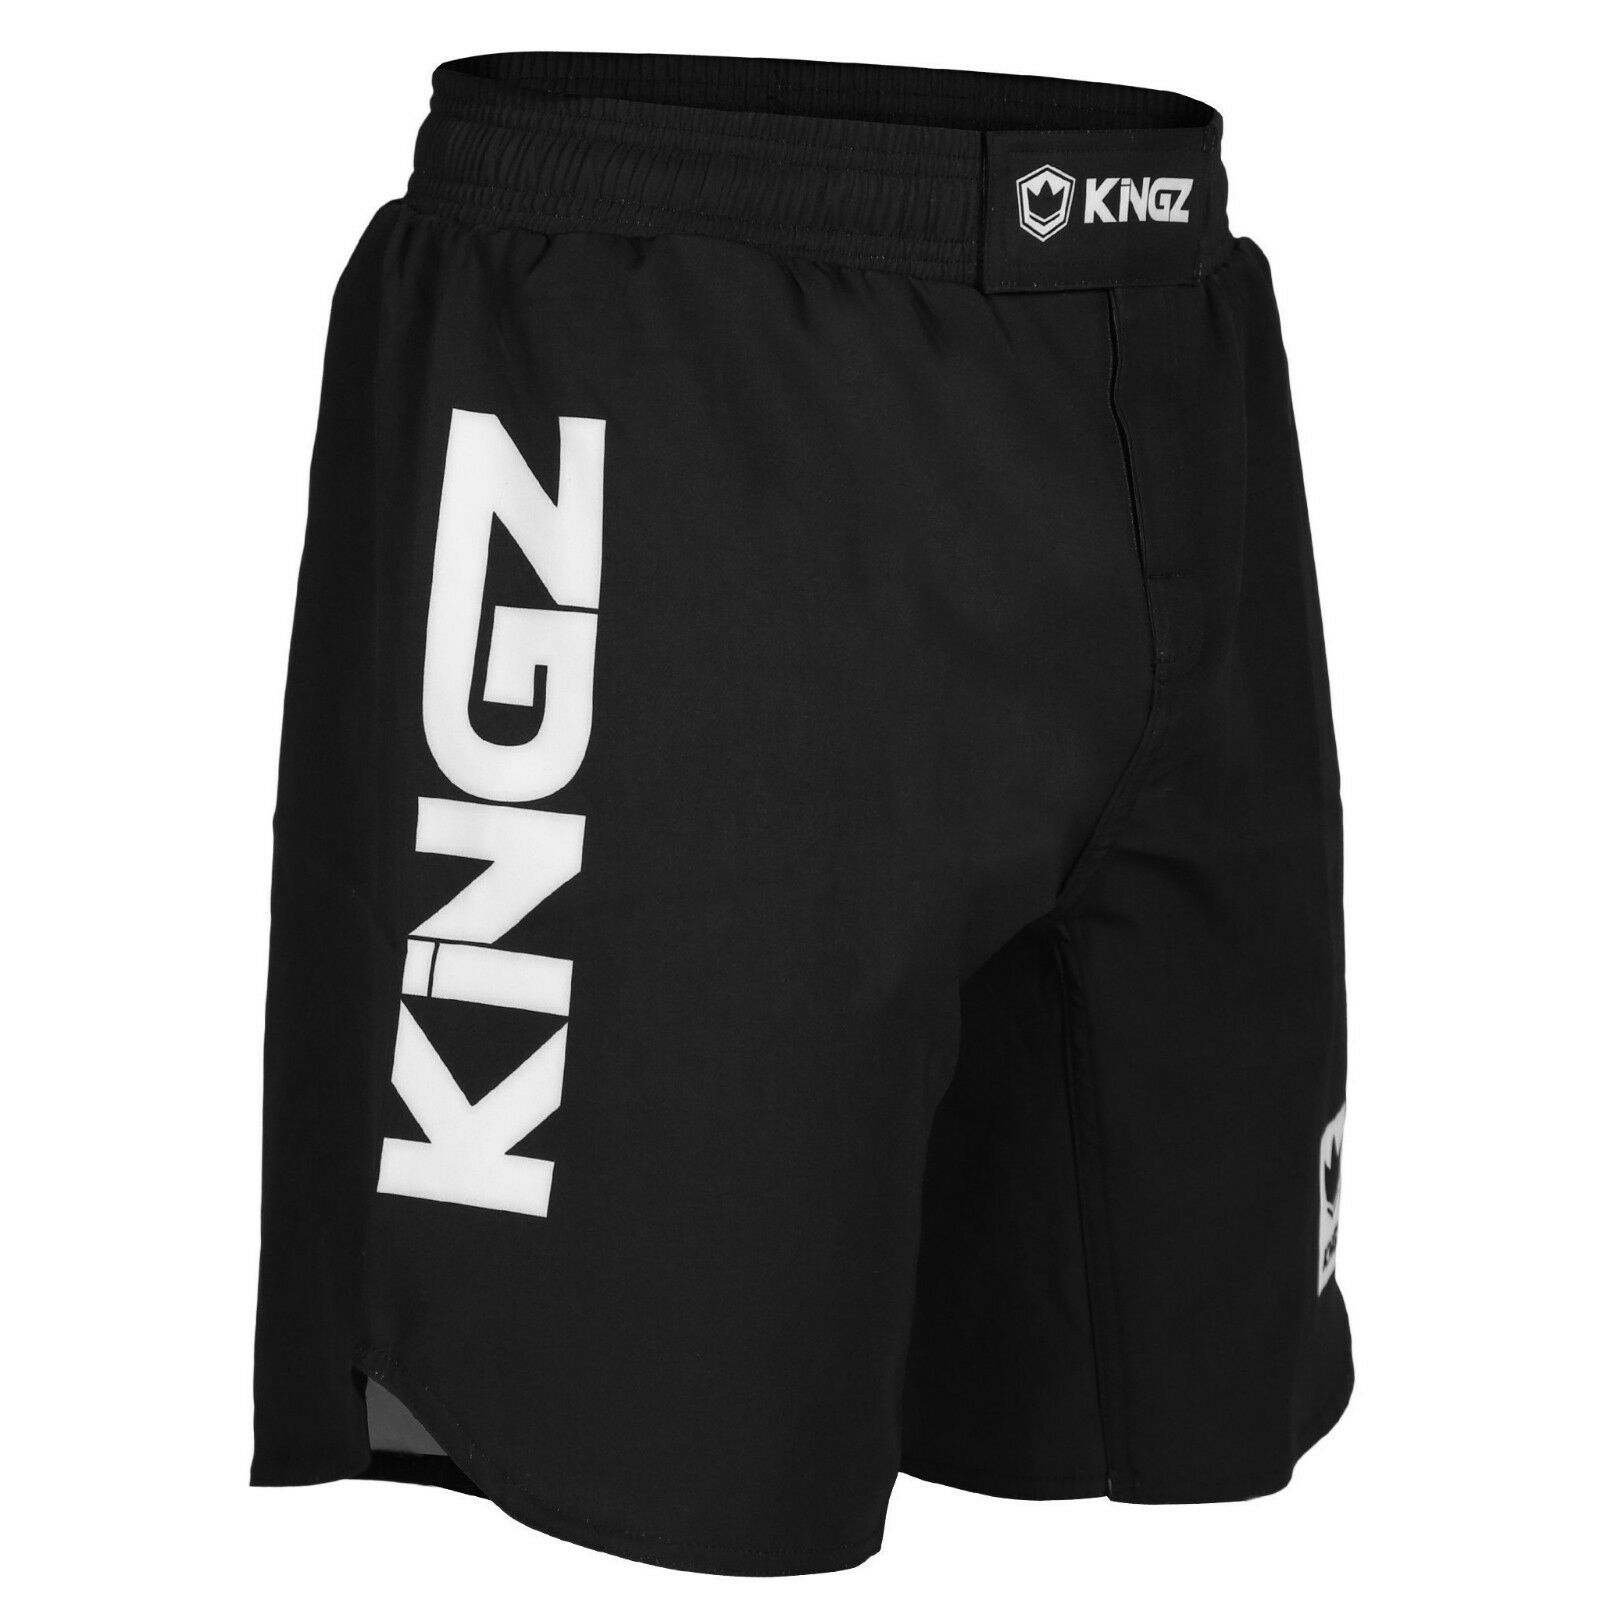 Kingz Wettbewerb Shorts Schwarz No-Gi Bjj Jiu Jitsu Ringen Ibbjf Genehmigt